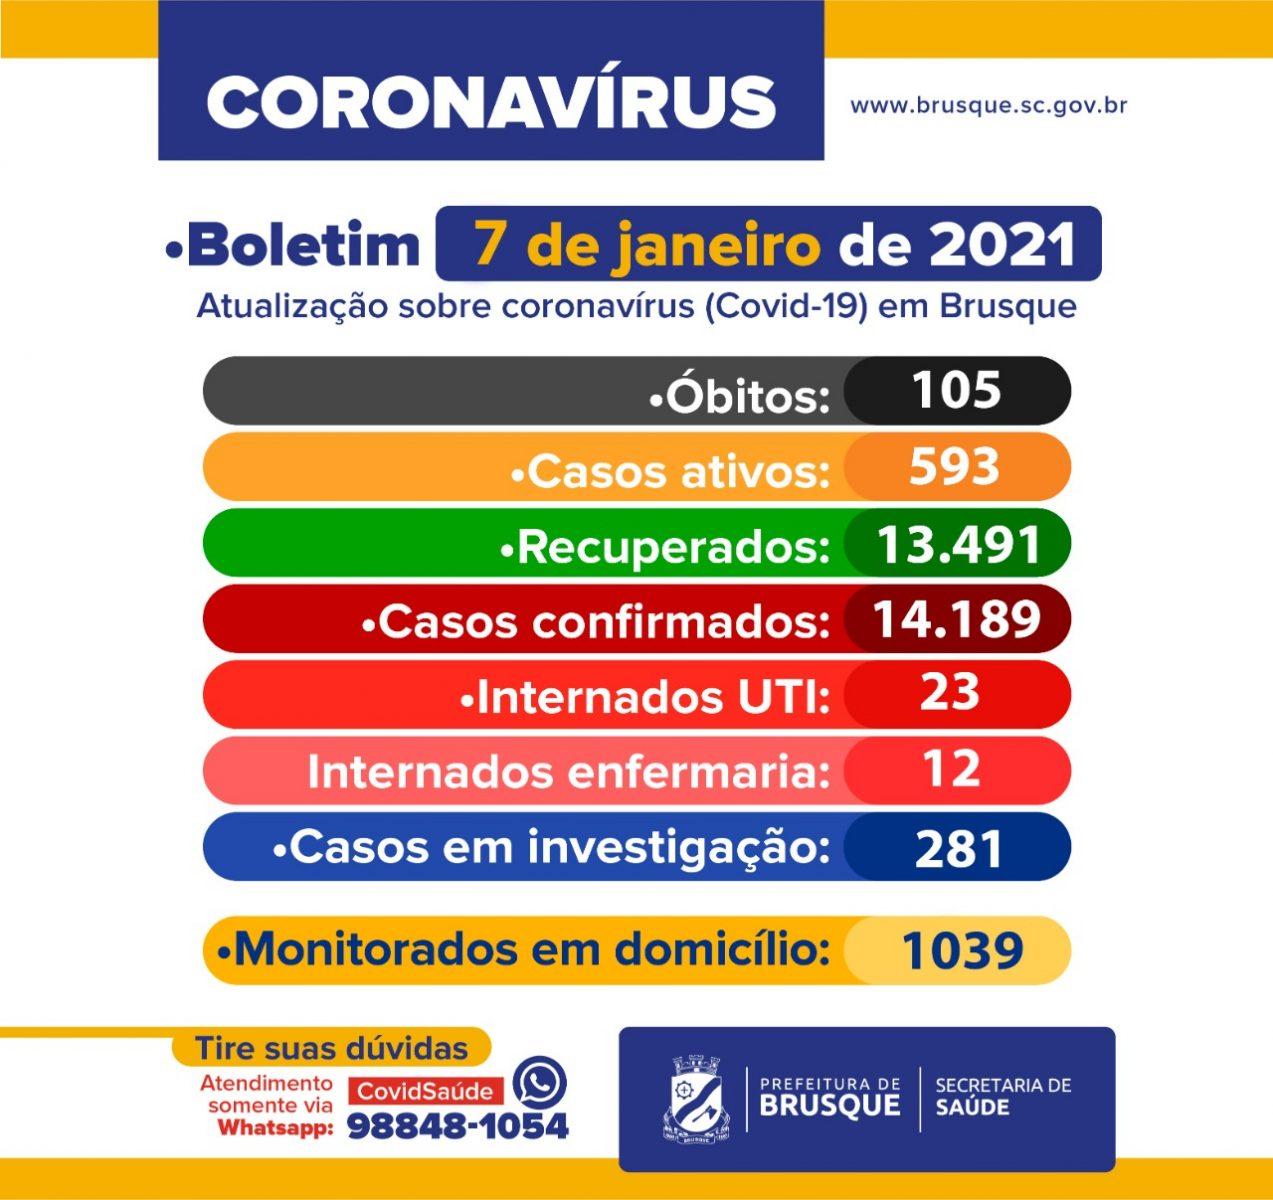 Covid-19: Confira o boletim epidemiológico desta quinta-feira (7)